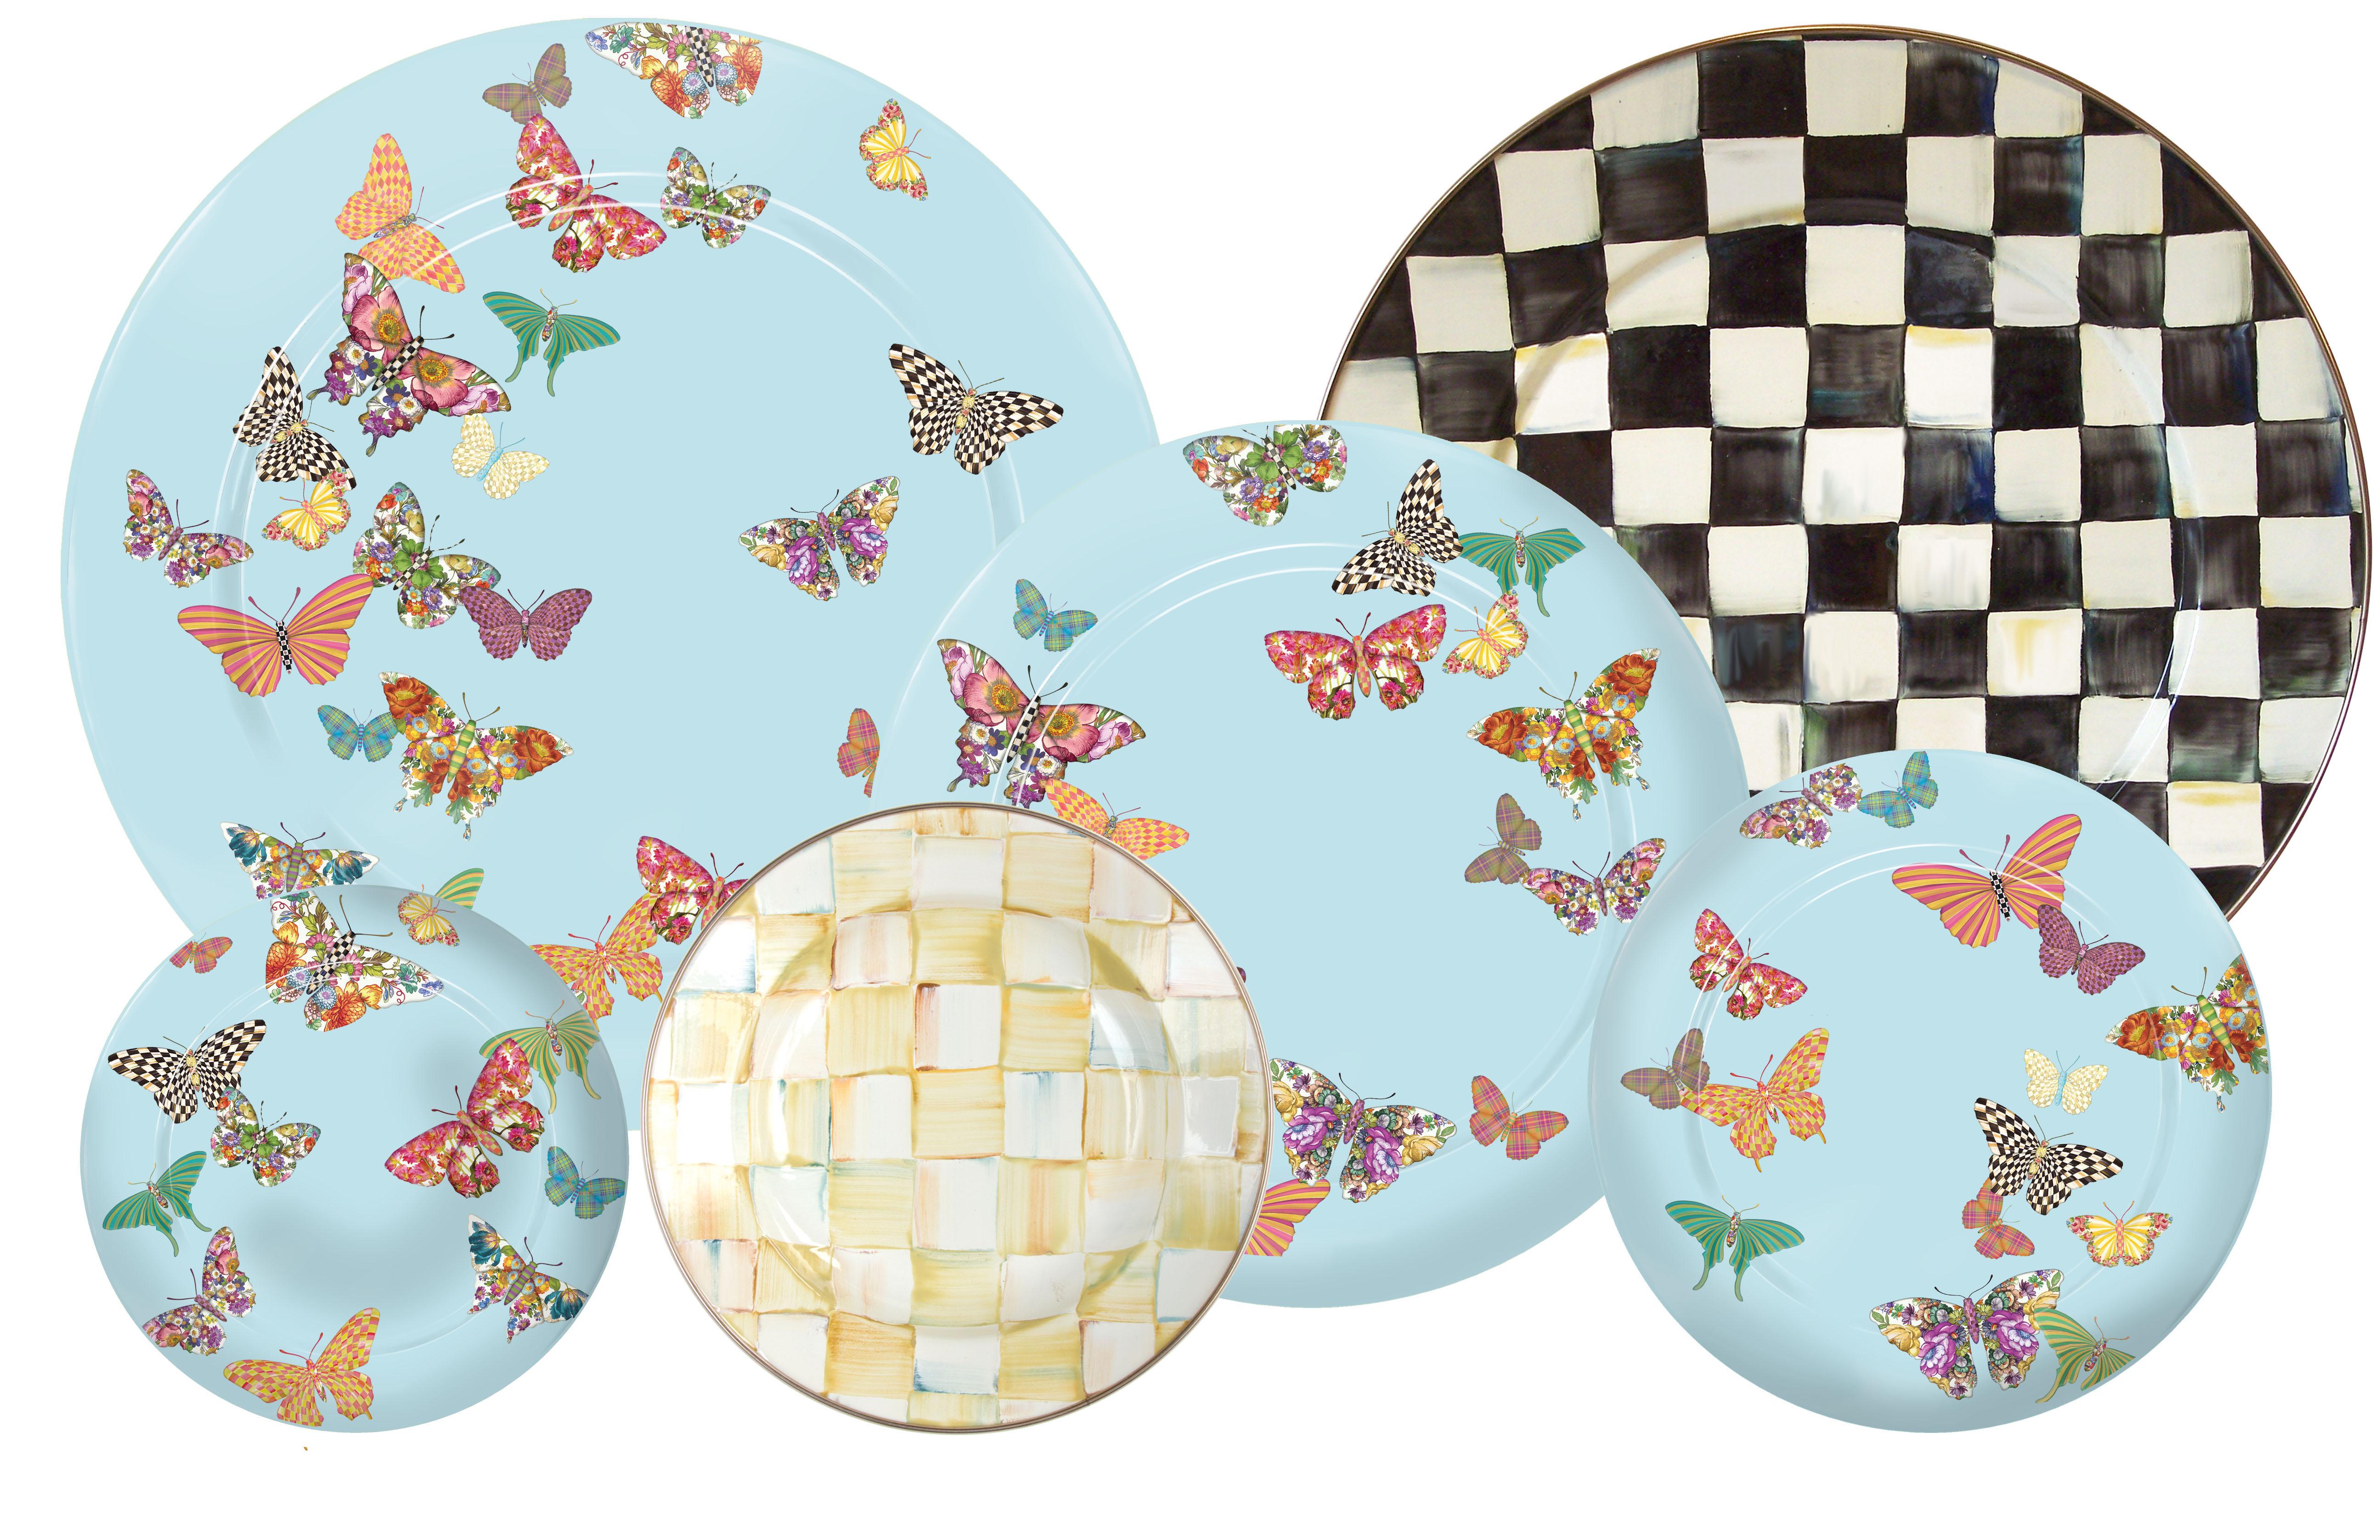 Sky Butterfly Garden Enamelware from MacKenzie-Childs  sc 1 st  Kitchenware News & Sky Butterfly Garden Enamelware from MacKenzie-Childs | Kitchenware ...